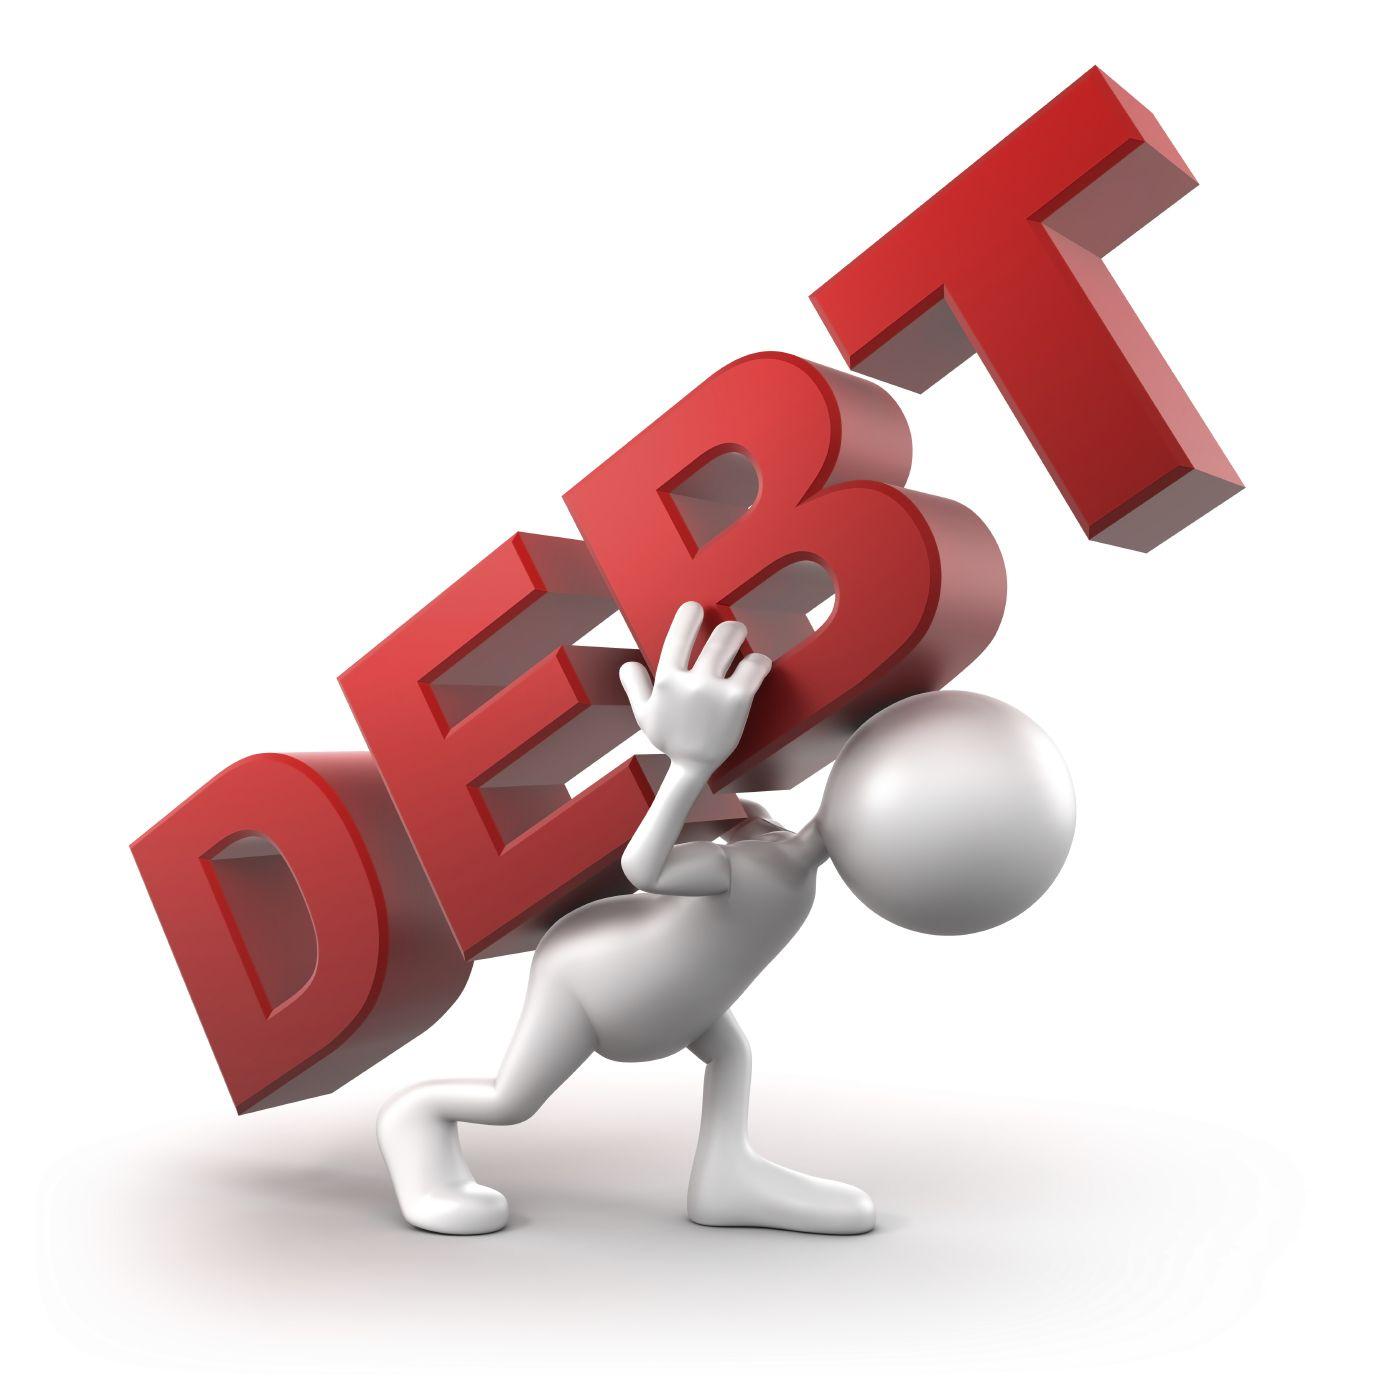 Money loan kitchener image 4